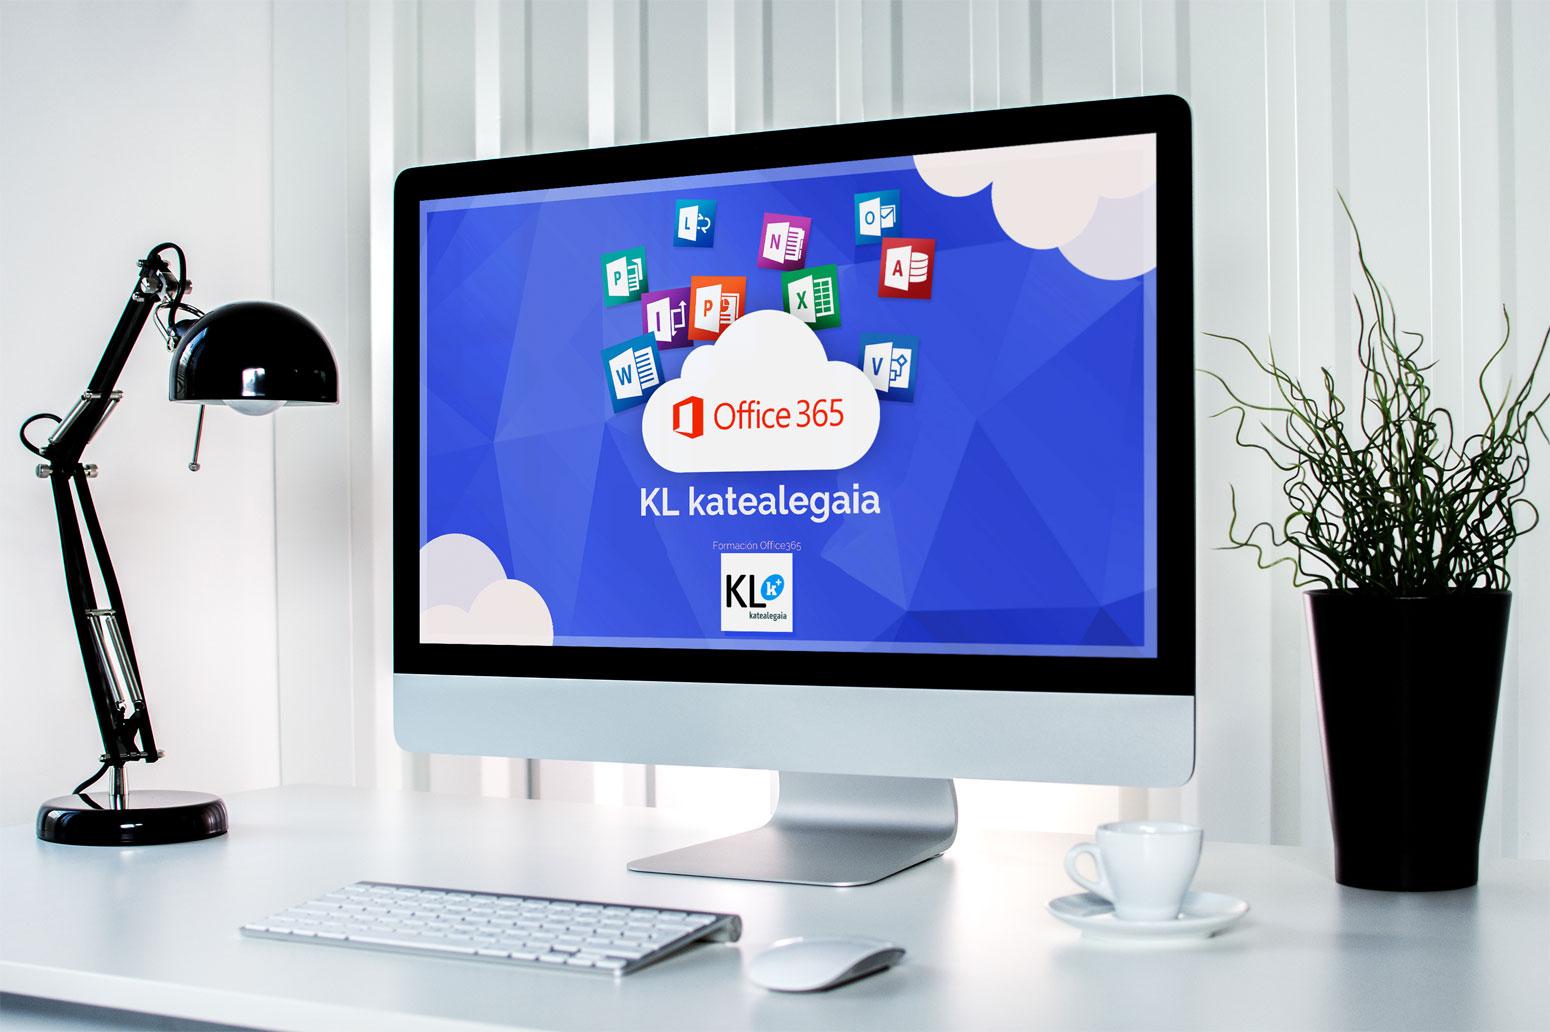 KL katealegaia implanta la herramienta colaborativa de Office 365